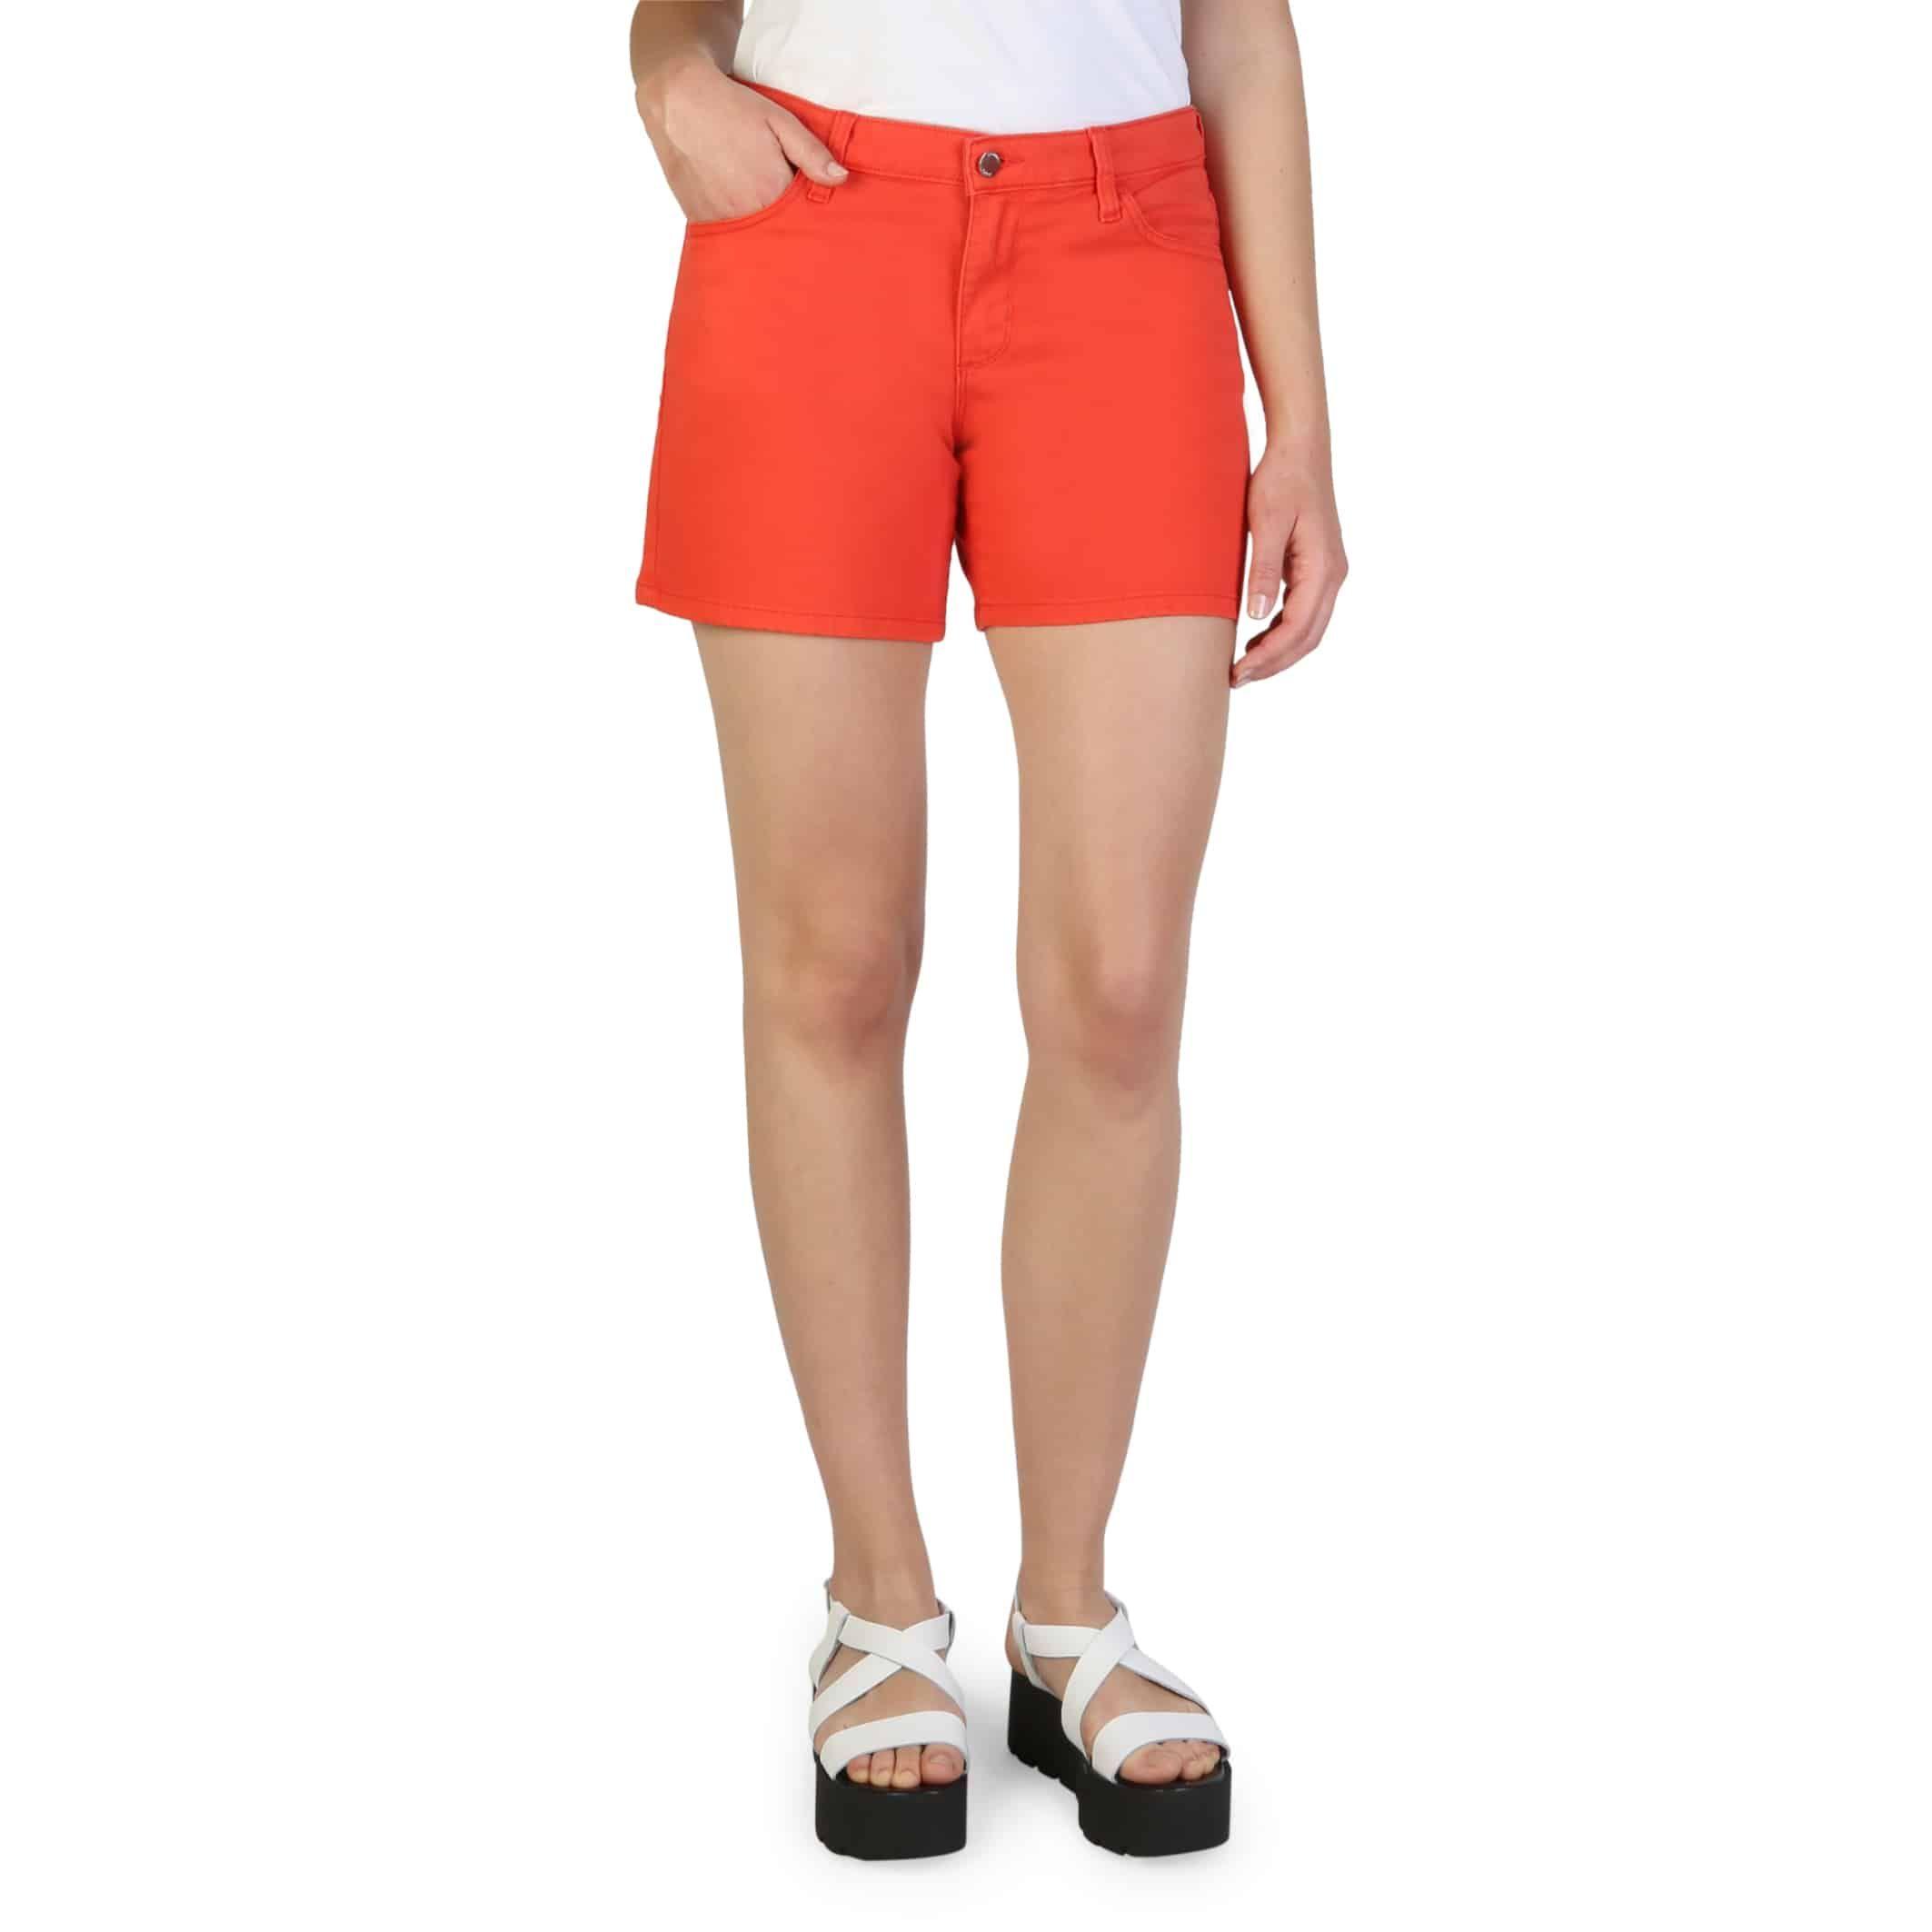 Bermuda Armani Jeans – 3Y5J05_5NXYZ